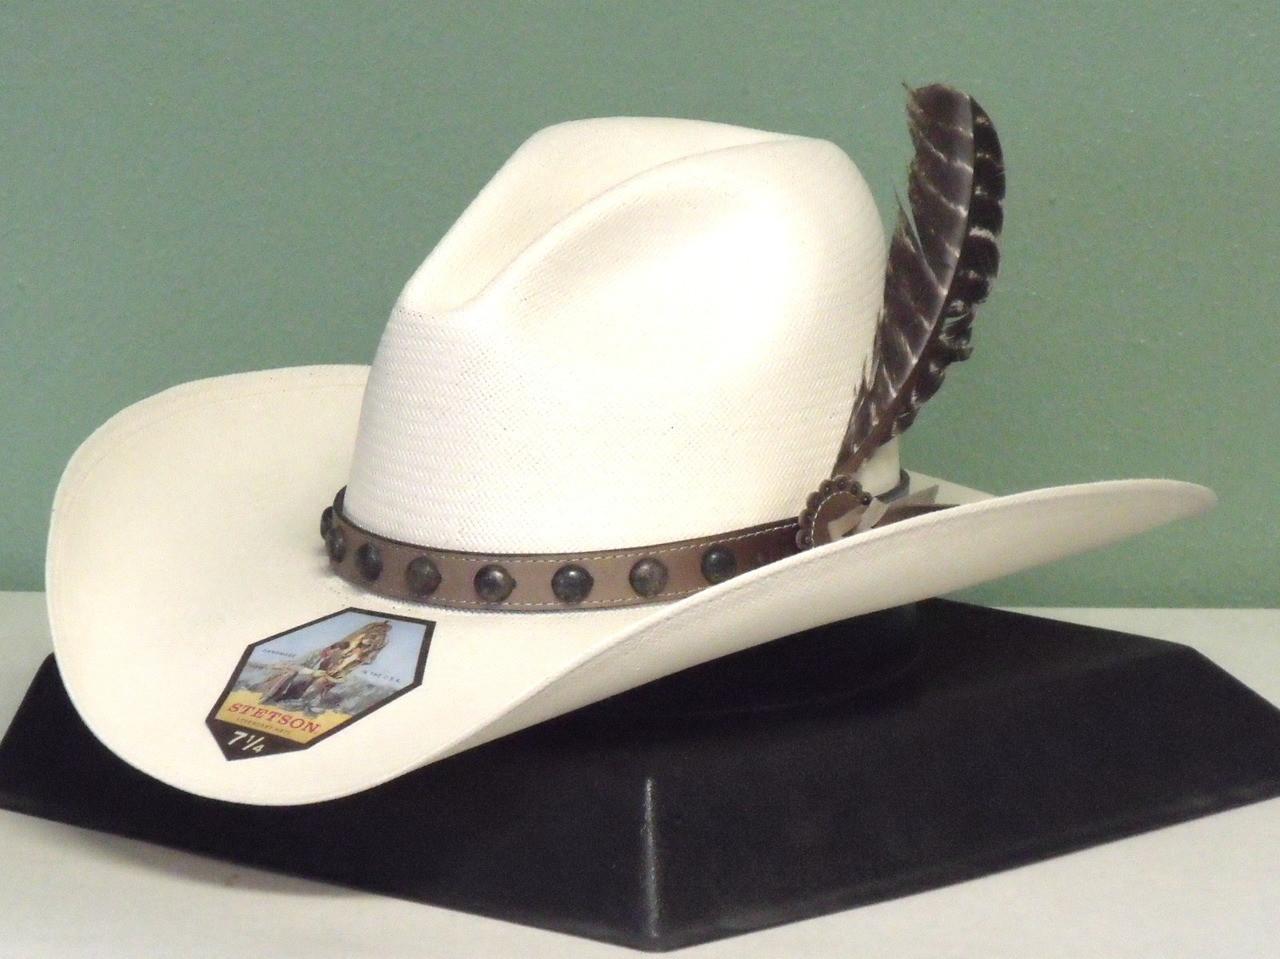 Stetson Broken Bow Shantung Straw Cowboy Hat - One 2 mini Ranch 1c744df47868